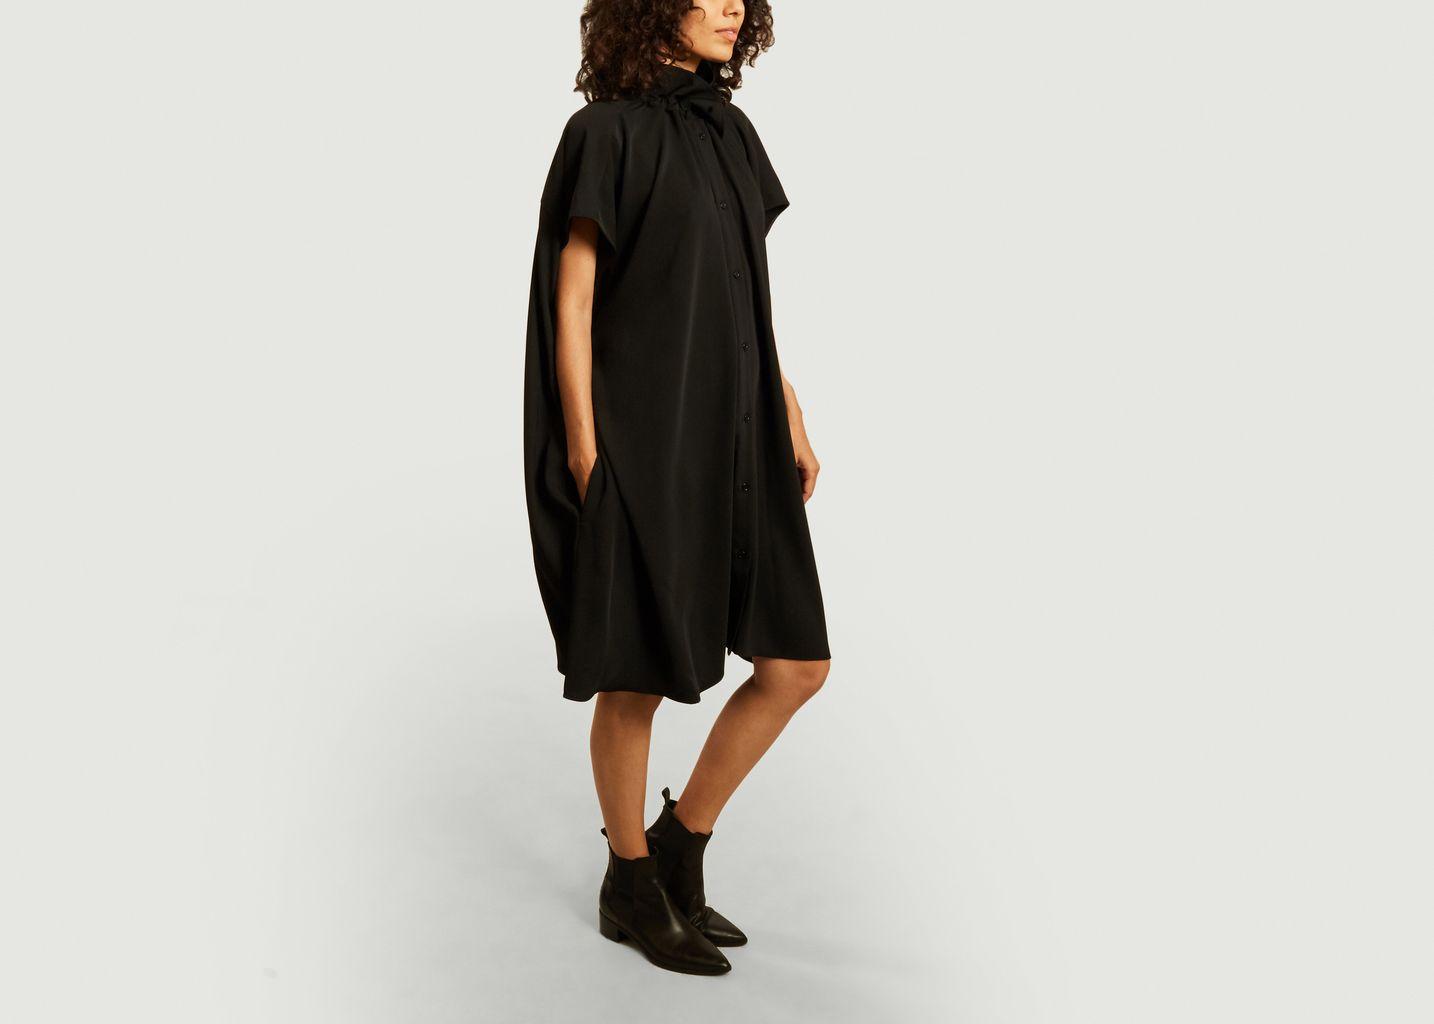 Buttoned short sleeves cape dress - MM6 Maison Margiela